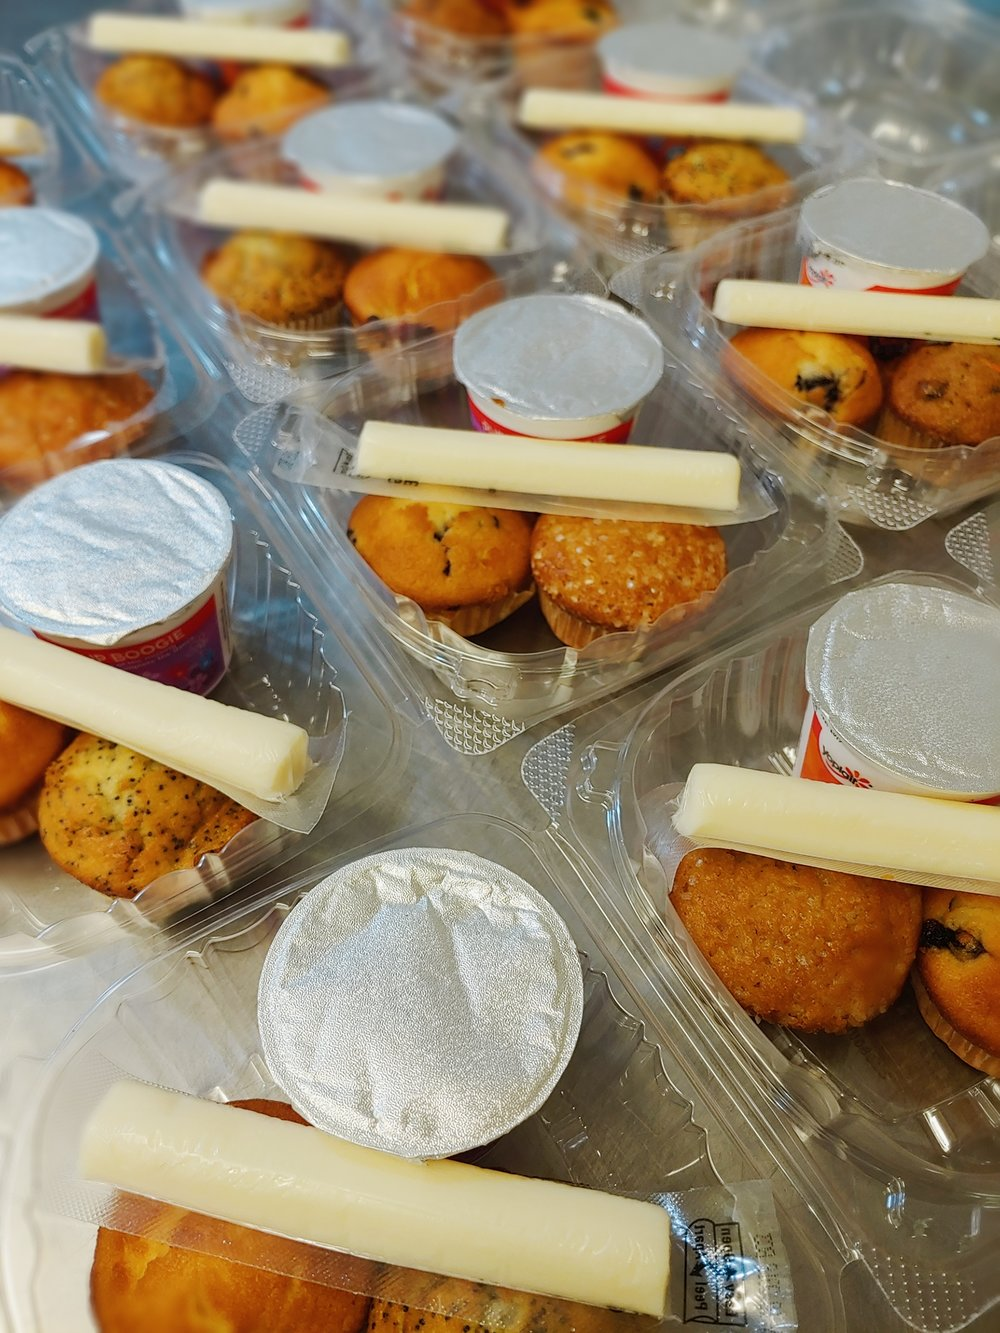 Muffins, cheese, and yogurt boxes